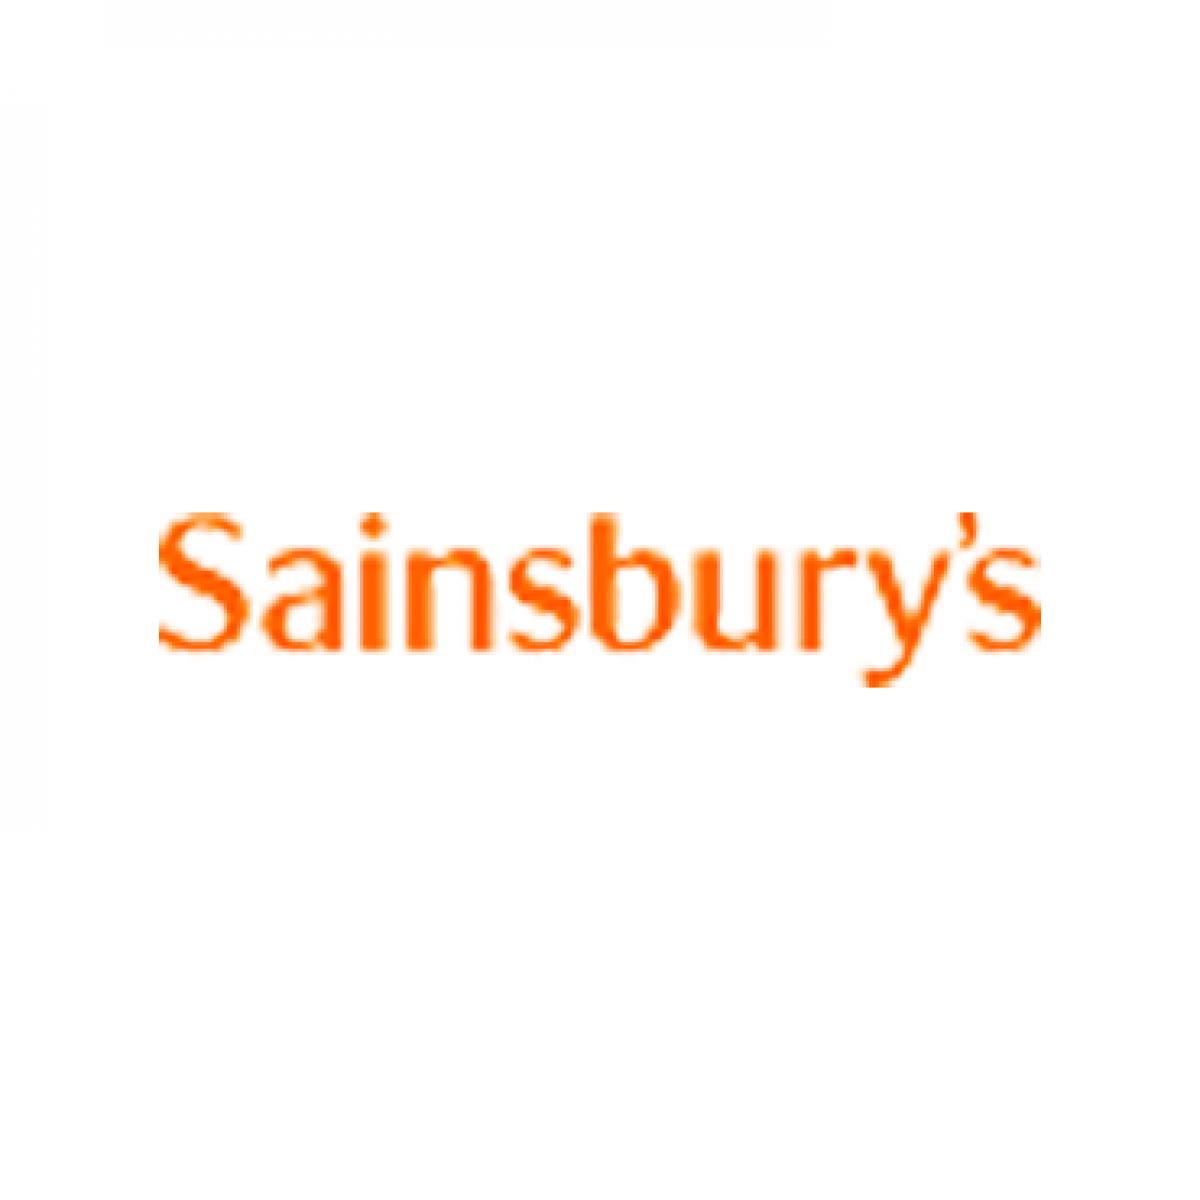 Sainsbury's Groceries